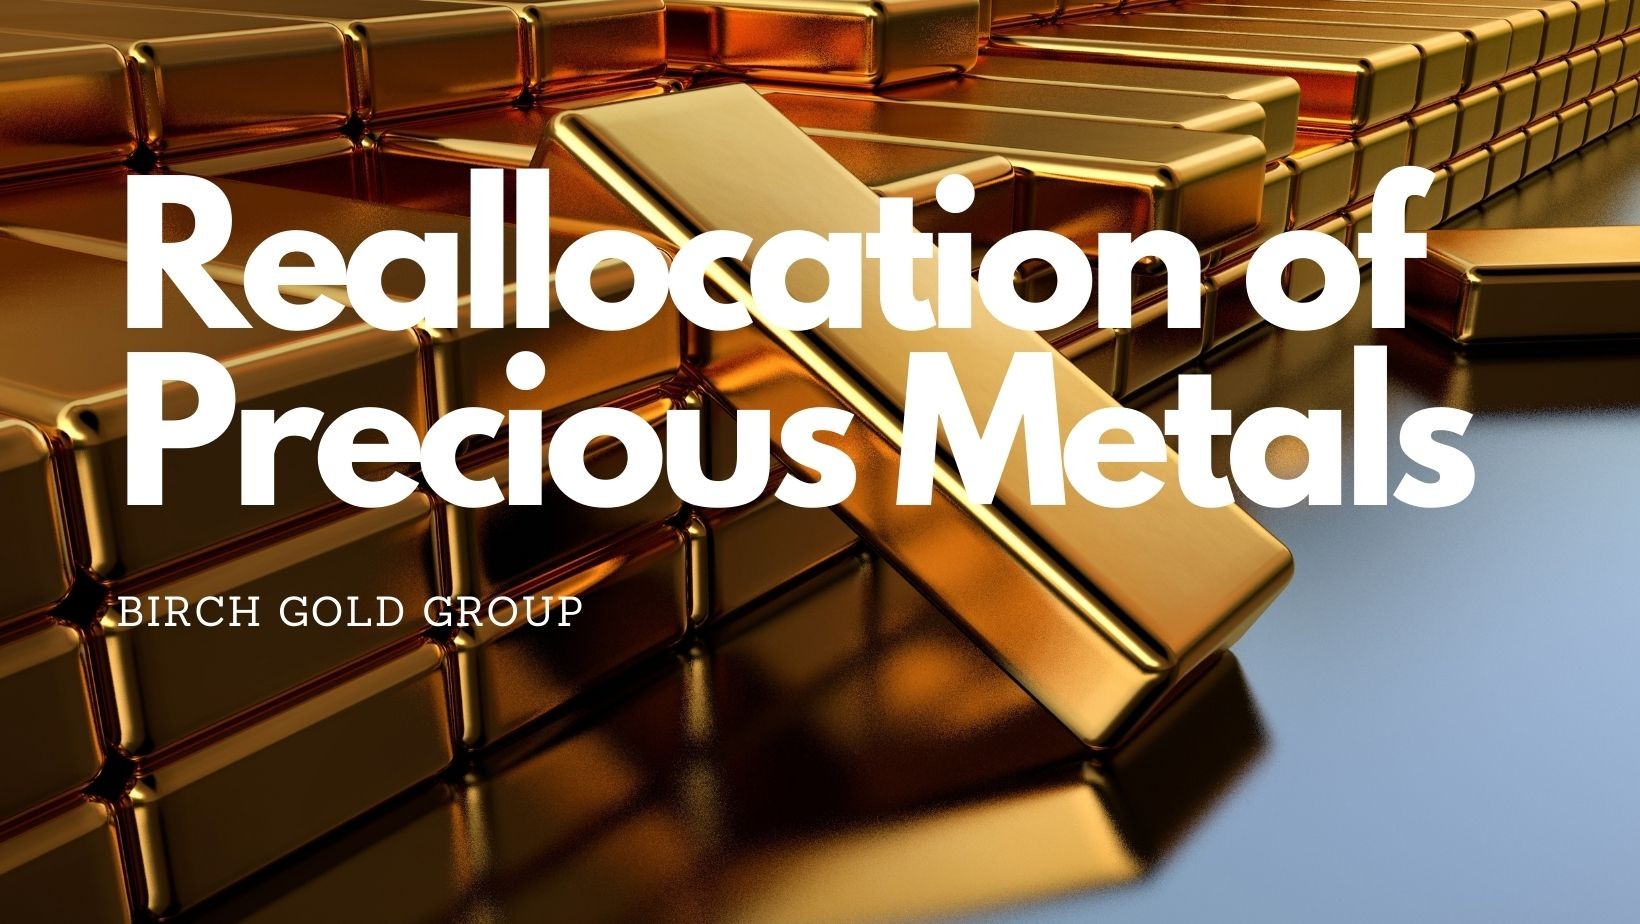 reallocation of precious metals gold bars hero image